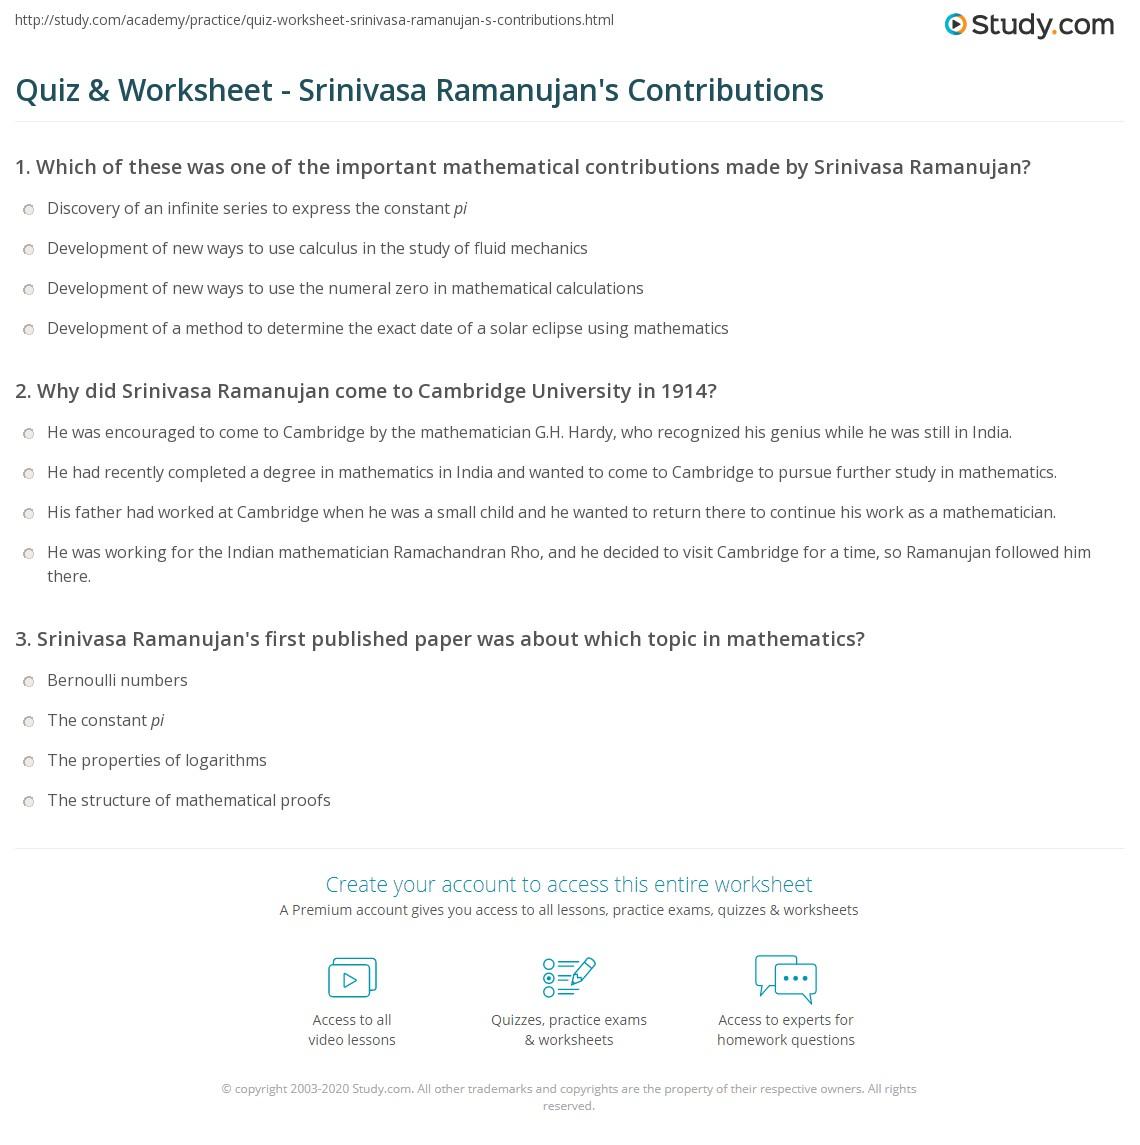 Quiz & Worksheet - Srinivasa Ramanujan's Contributions | Study com